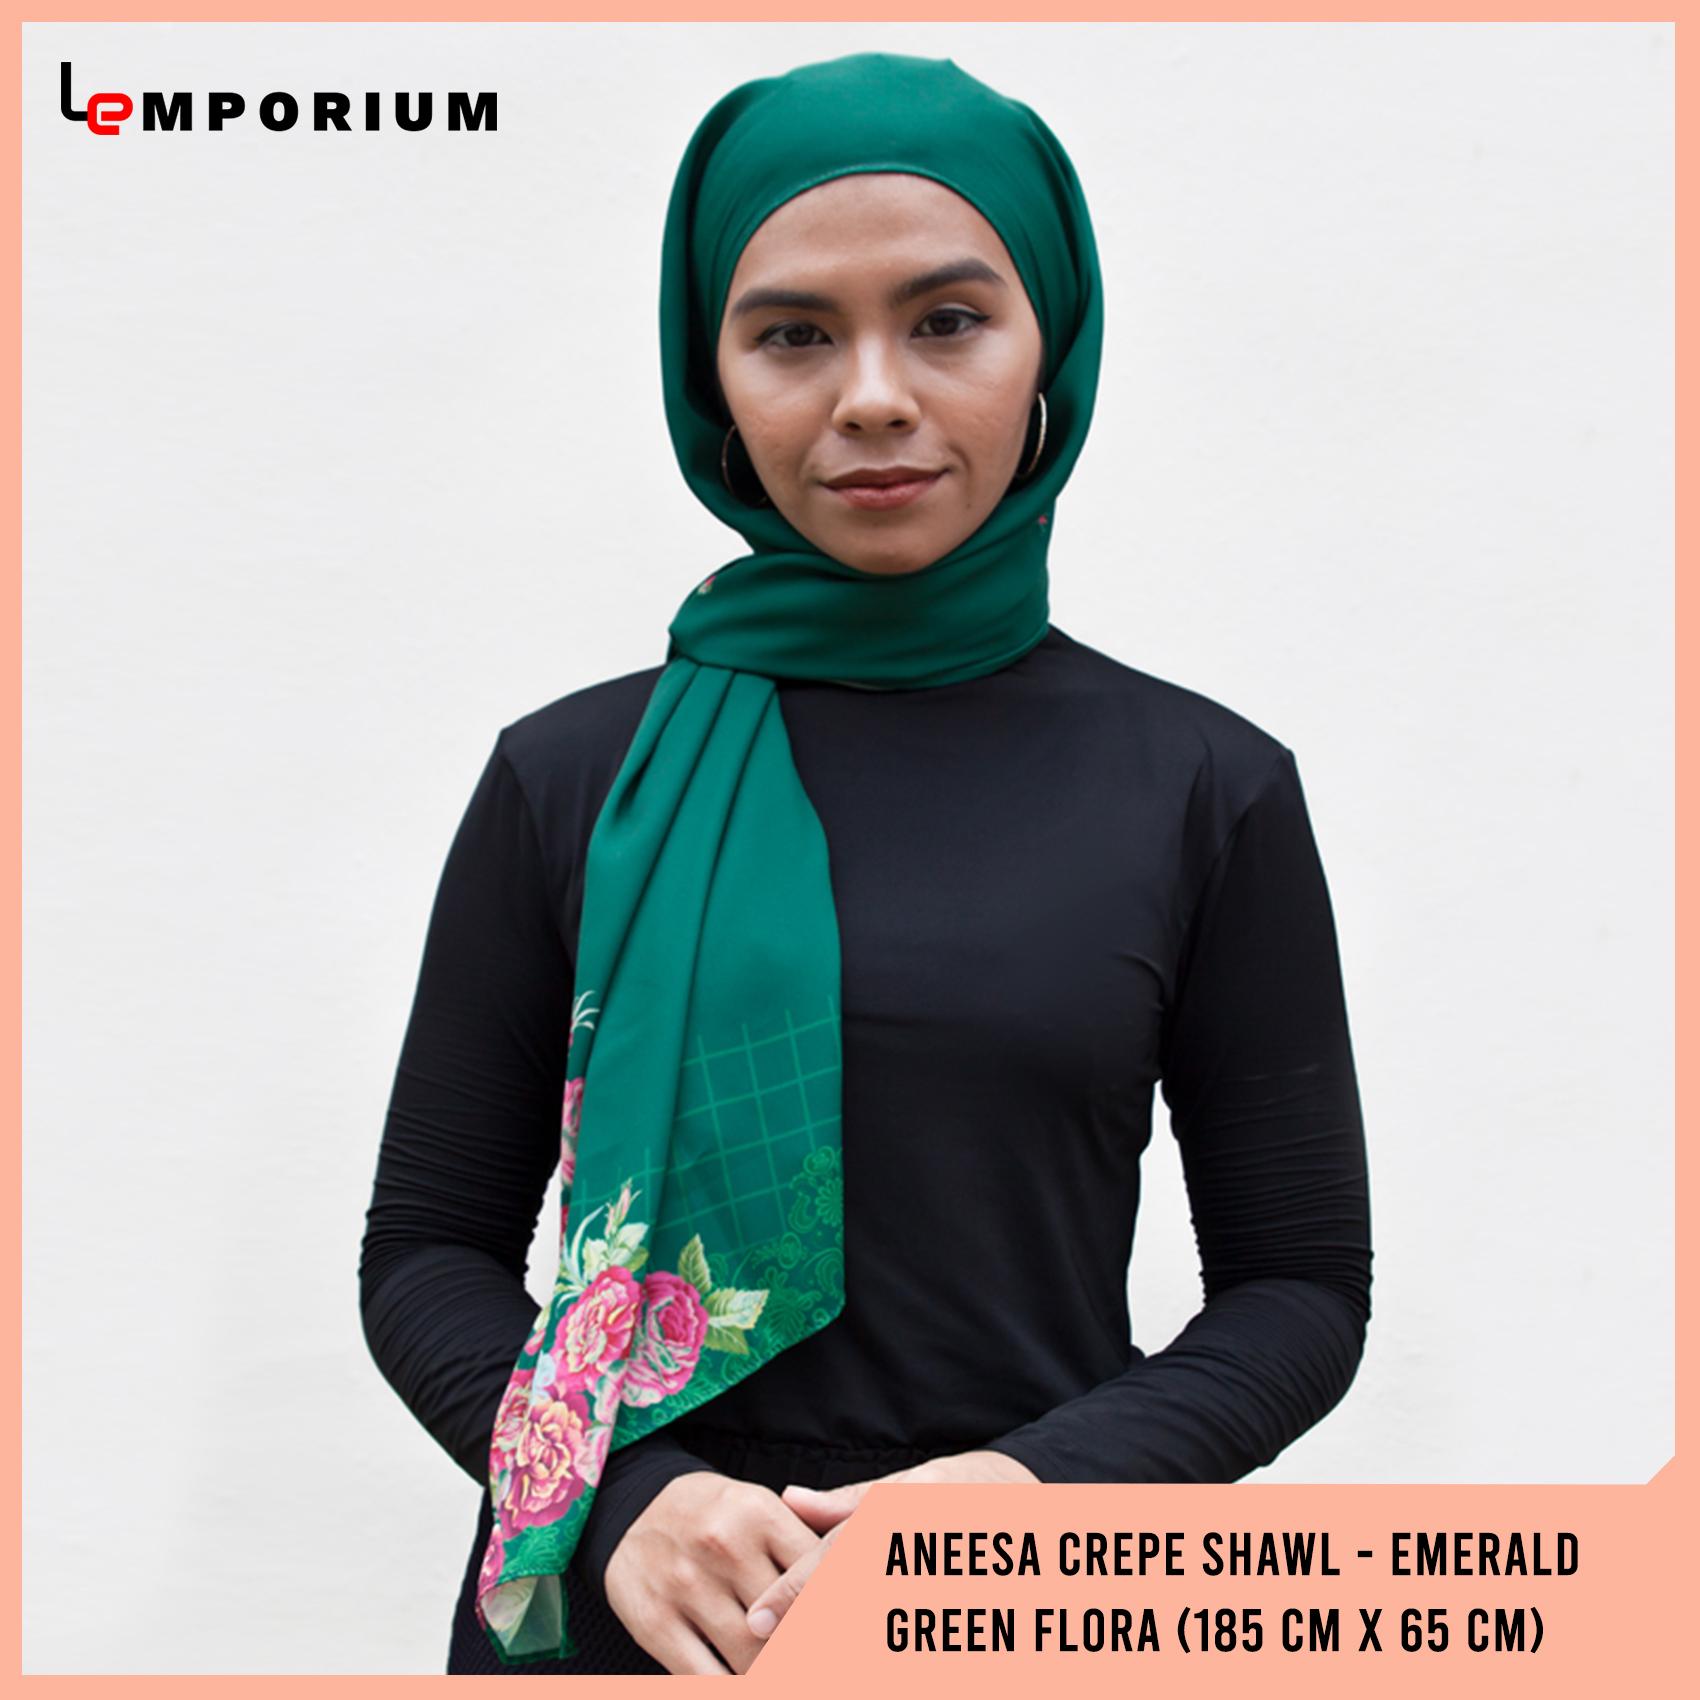 ANEESA-Crepe-Shawl---Emerald-Green-Flora-(185-cm-x-65-cm).jpg